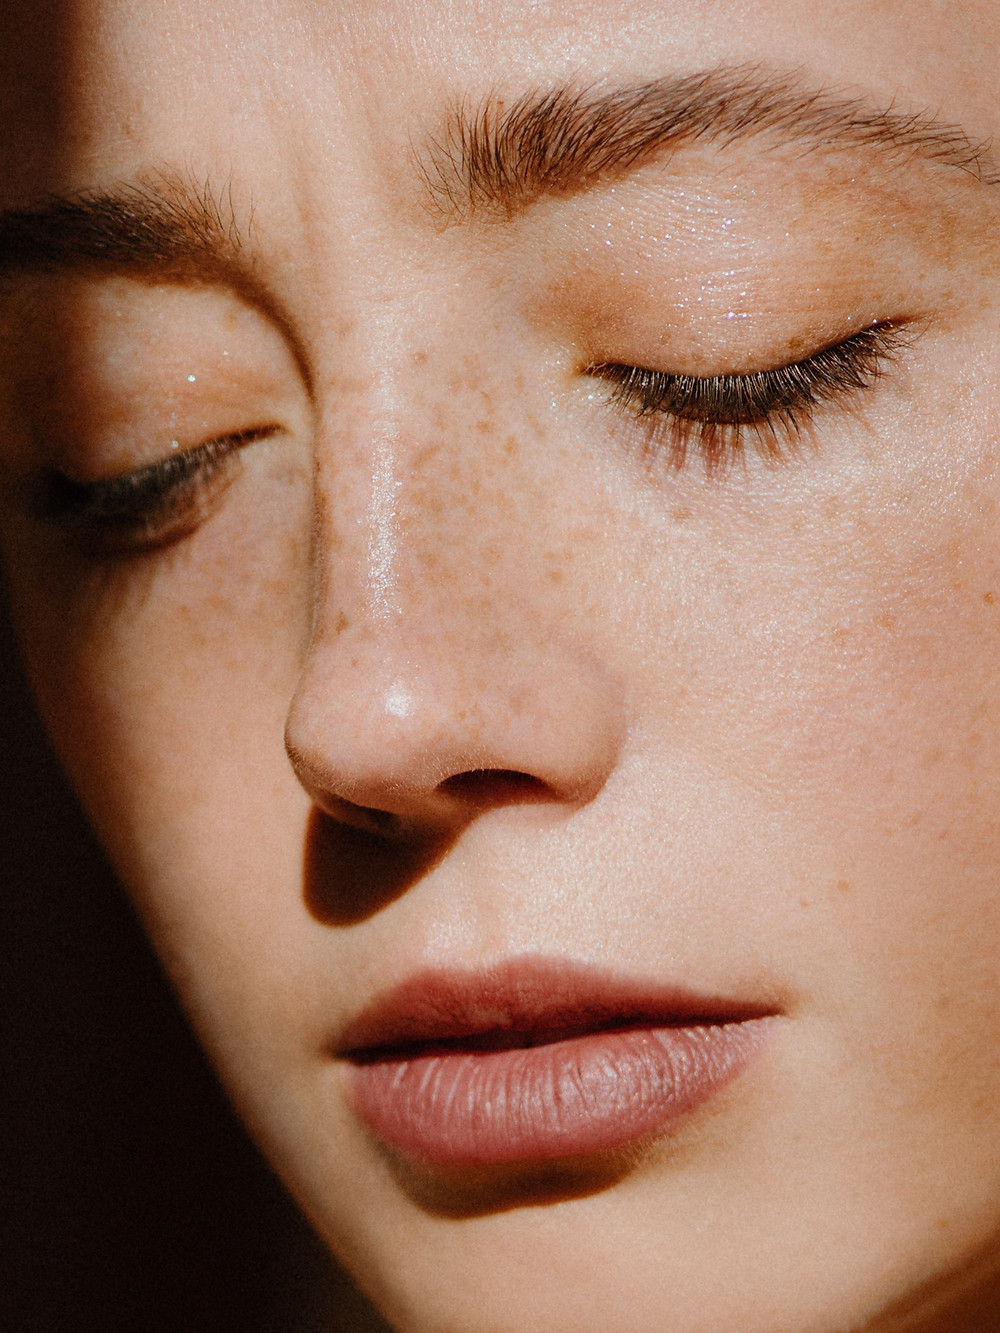 White women, clear skin, freckles, glowy skin, dewy skin, healthy skin